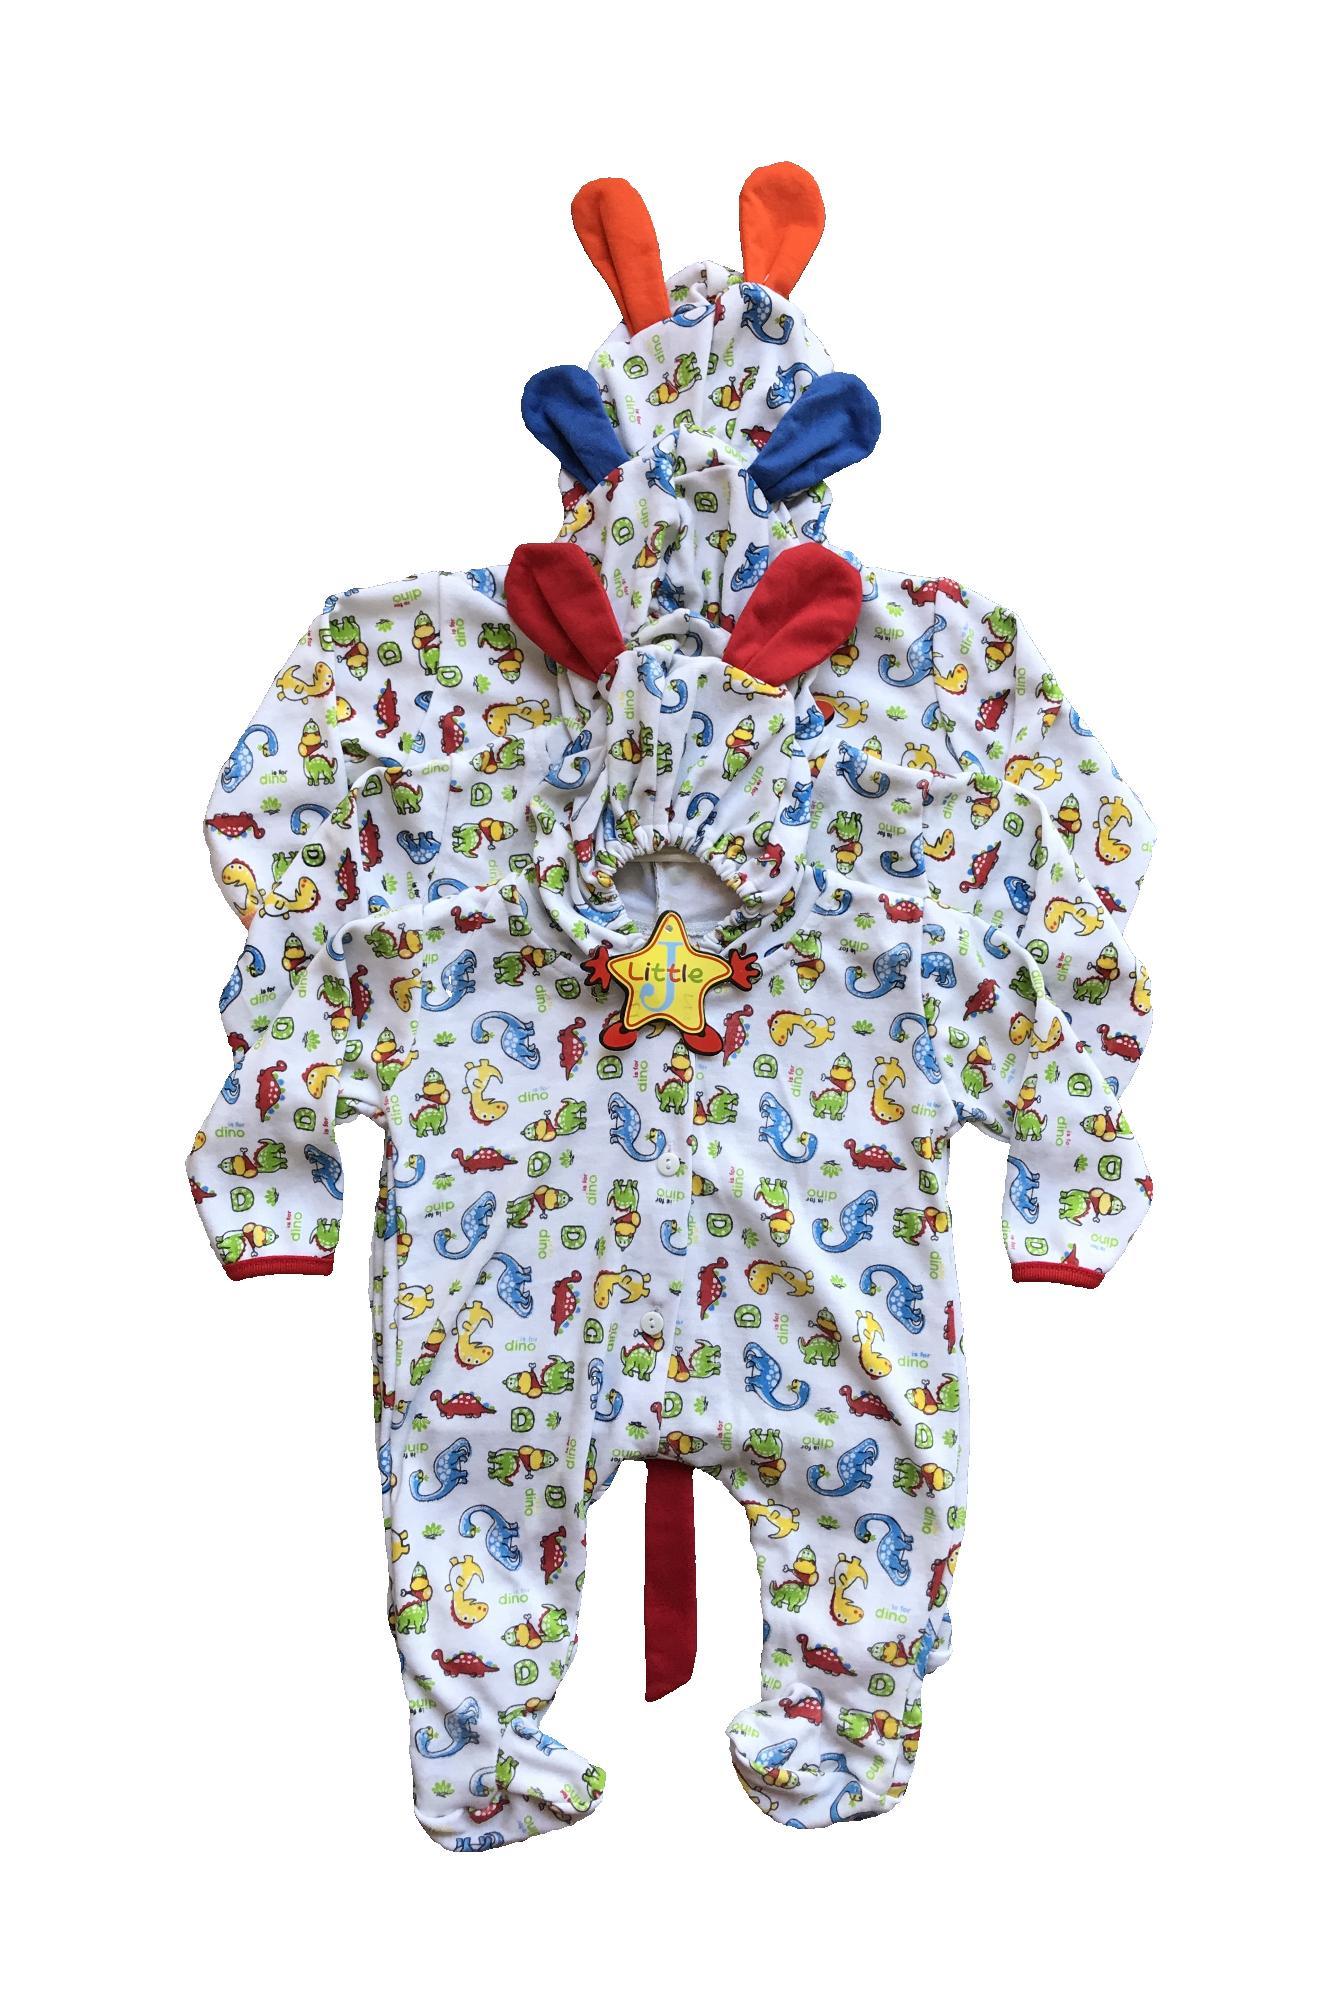 BAYIe - 3 pcs Baju Bayi model Jumper Panjang Buntu  motif Lucu LITTLE usia 0 - 6 bulan katun/pakaian Jumsuit bayi /baju bayi new born